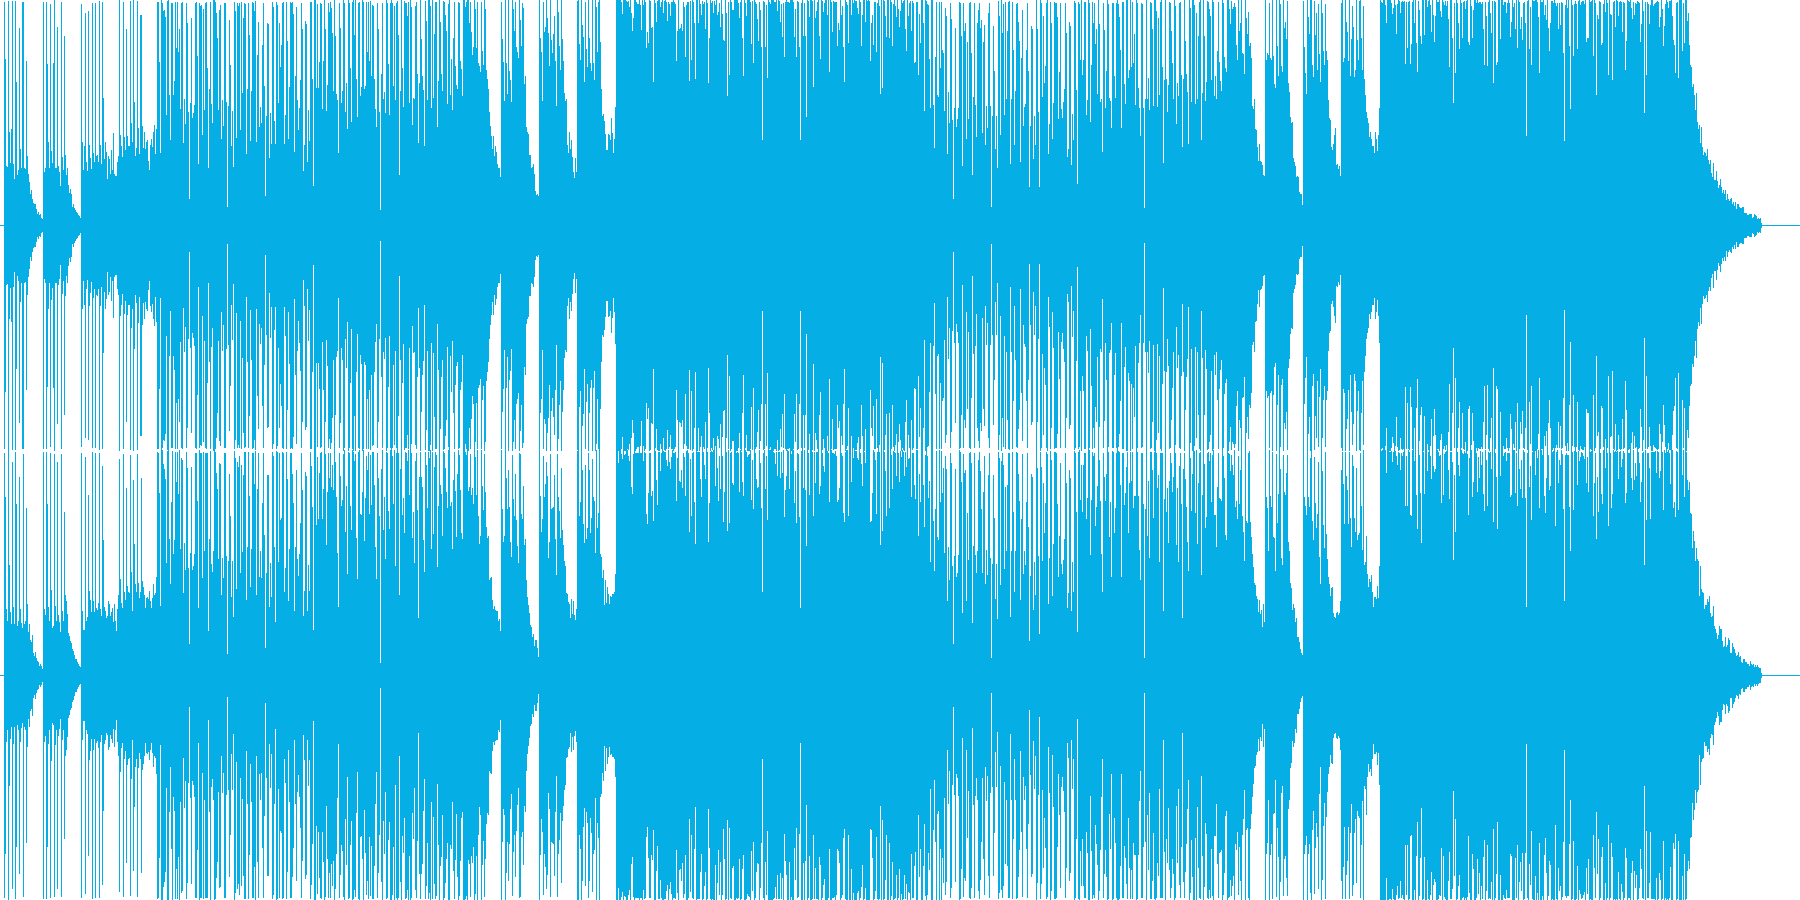 EDMクラブ系ダンスミュージック_1の再生済みの波形